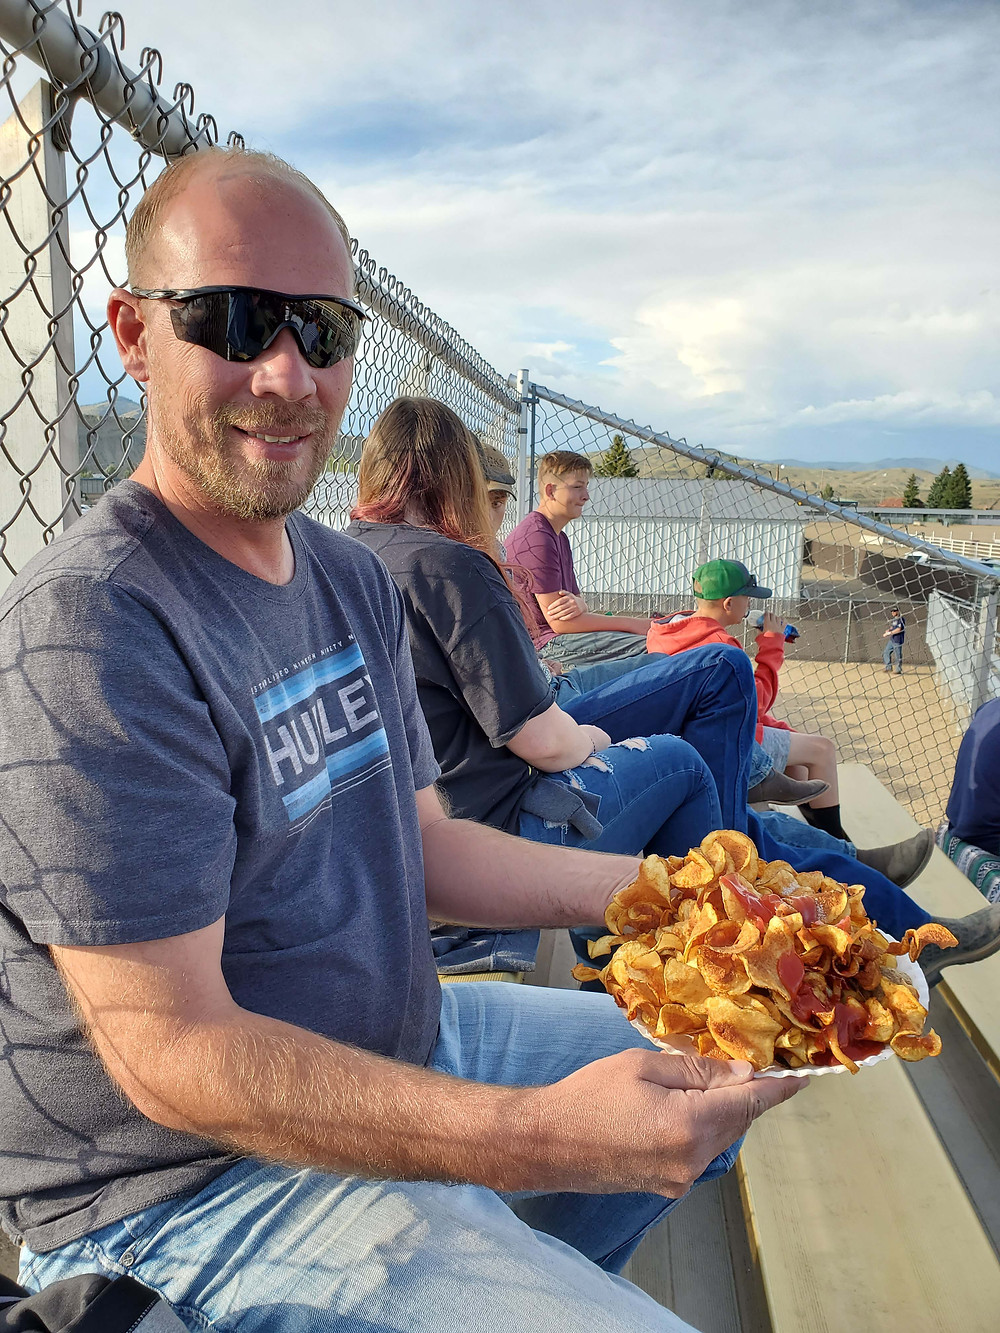 Man showing off fresh warm potato chips.